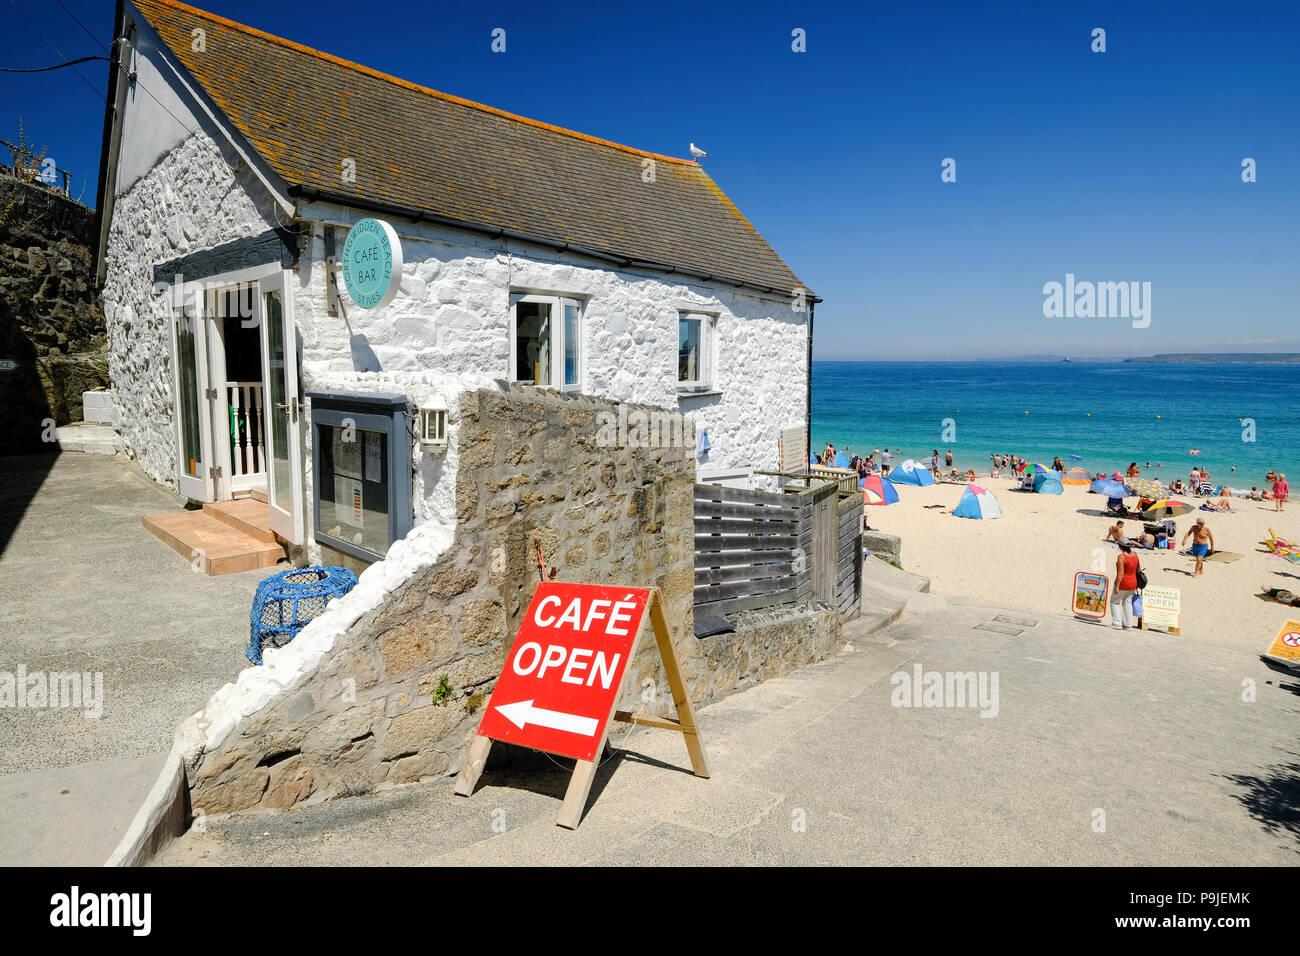 Porthgwidden Beach Cafe Menu